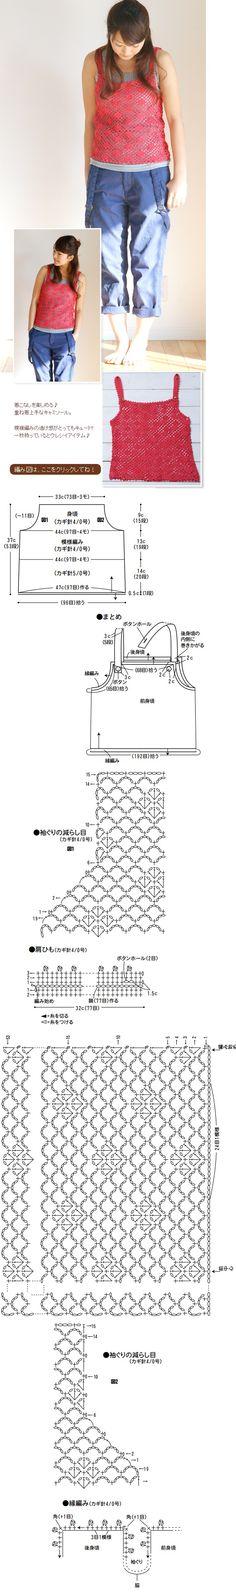 Linda blusinha de verão/crochet layout chart pattern diagram for top